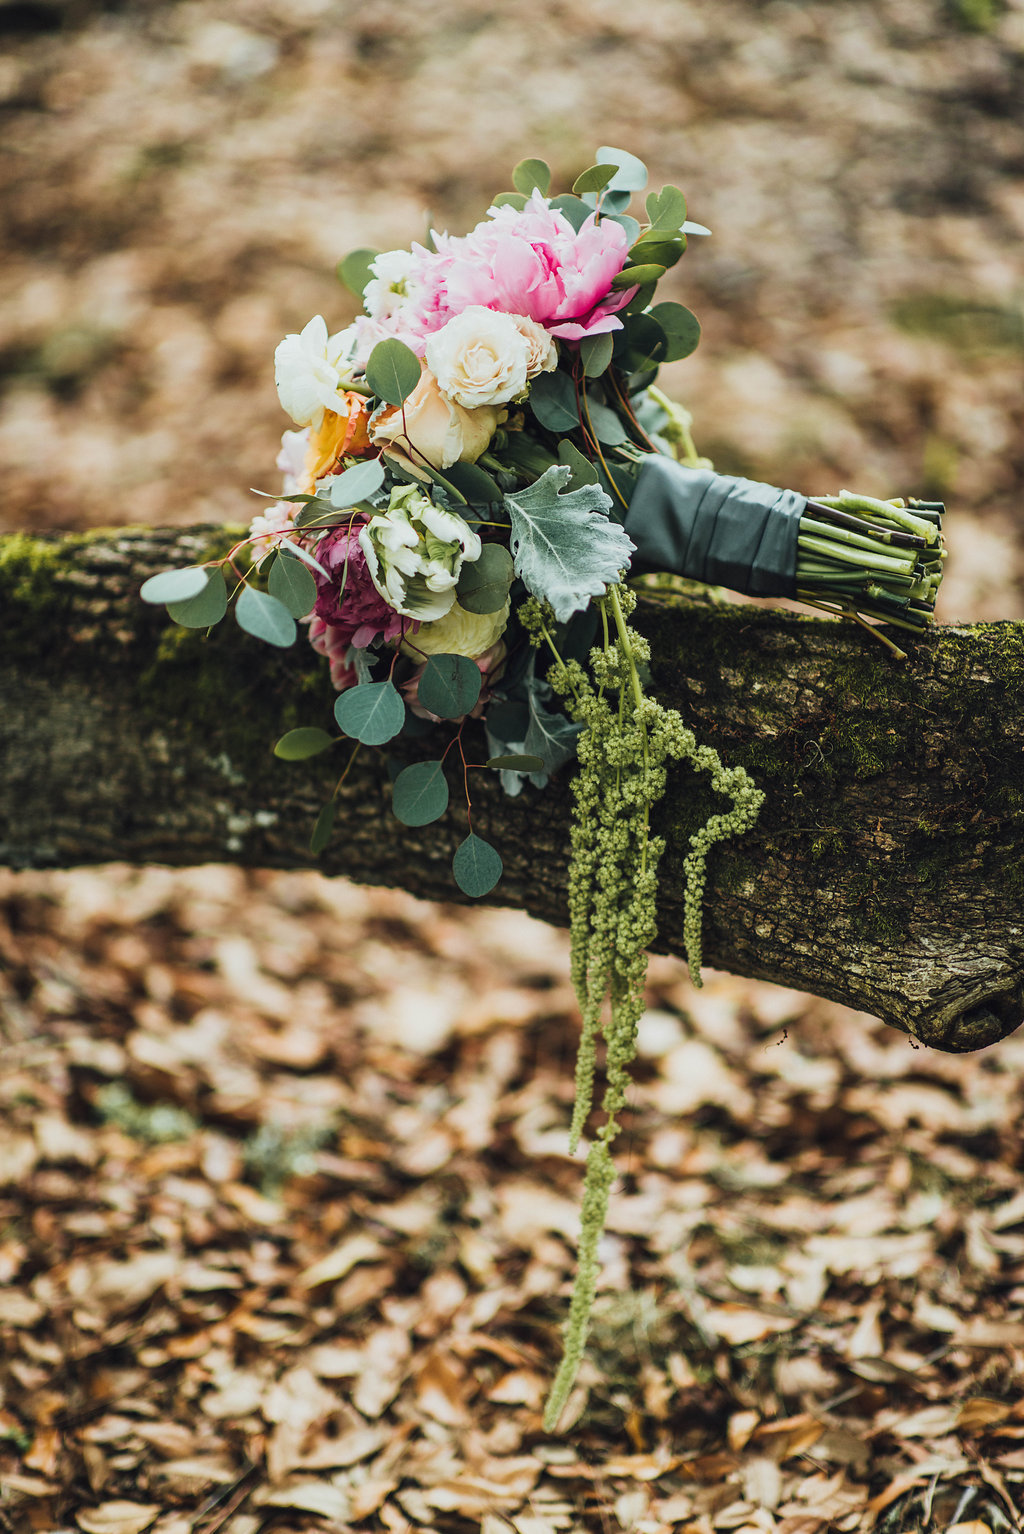 Urban-Poppy-Southern-Wedding-Mallory-and-Justin-photography-ivory-and-beau-bridal-boutique-sarah-seven-marion-boho-bride-indie-bride-indie-wedding-dress-savannah-weddings-hilton-head-weddings-beach-wedding-9.jpg